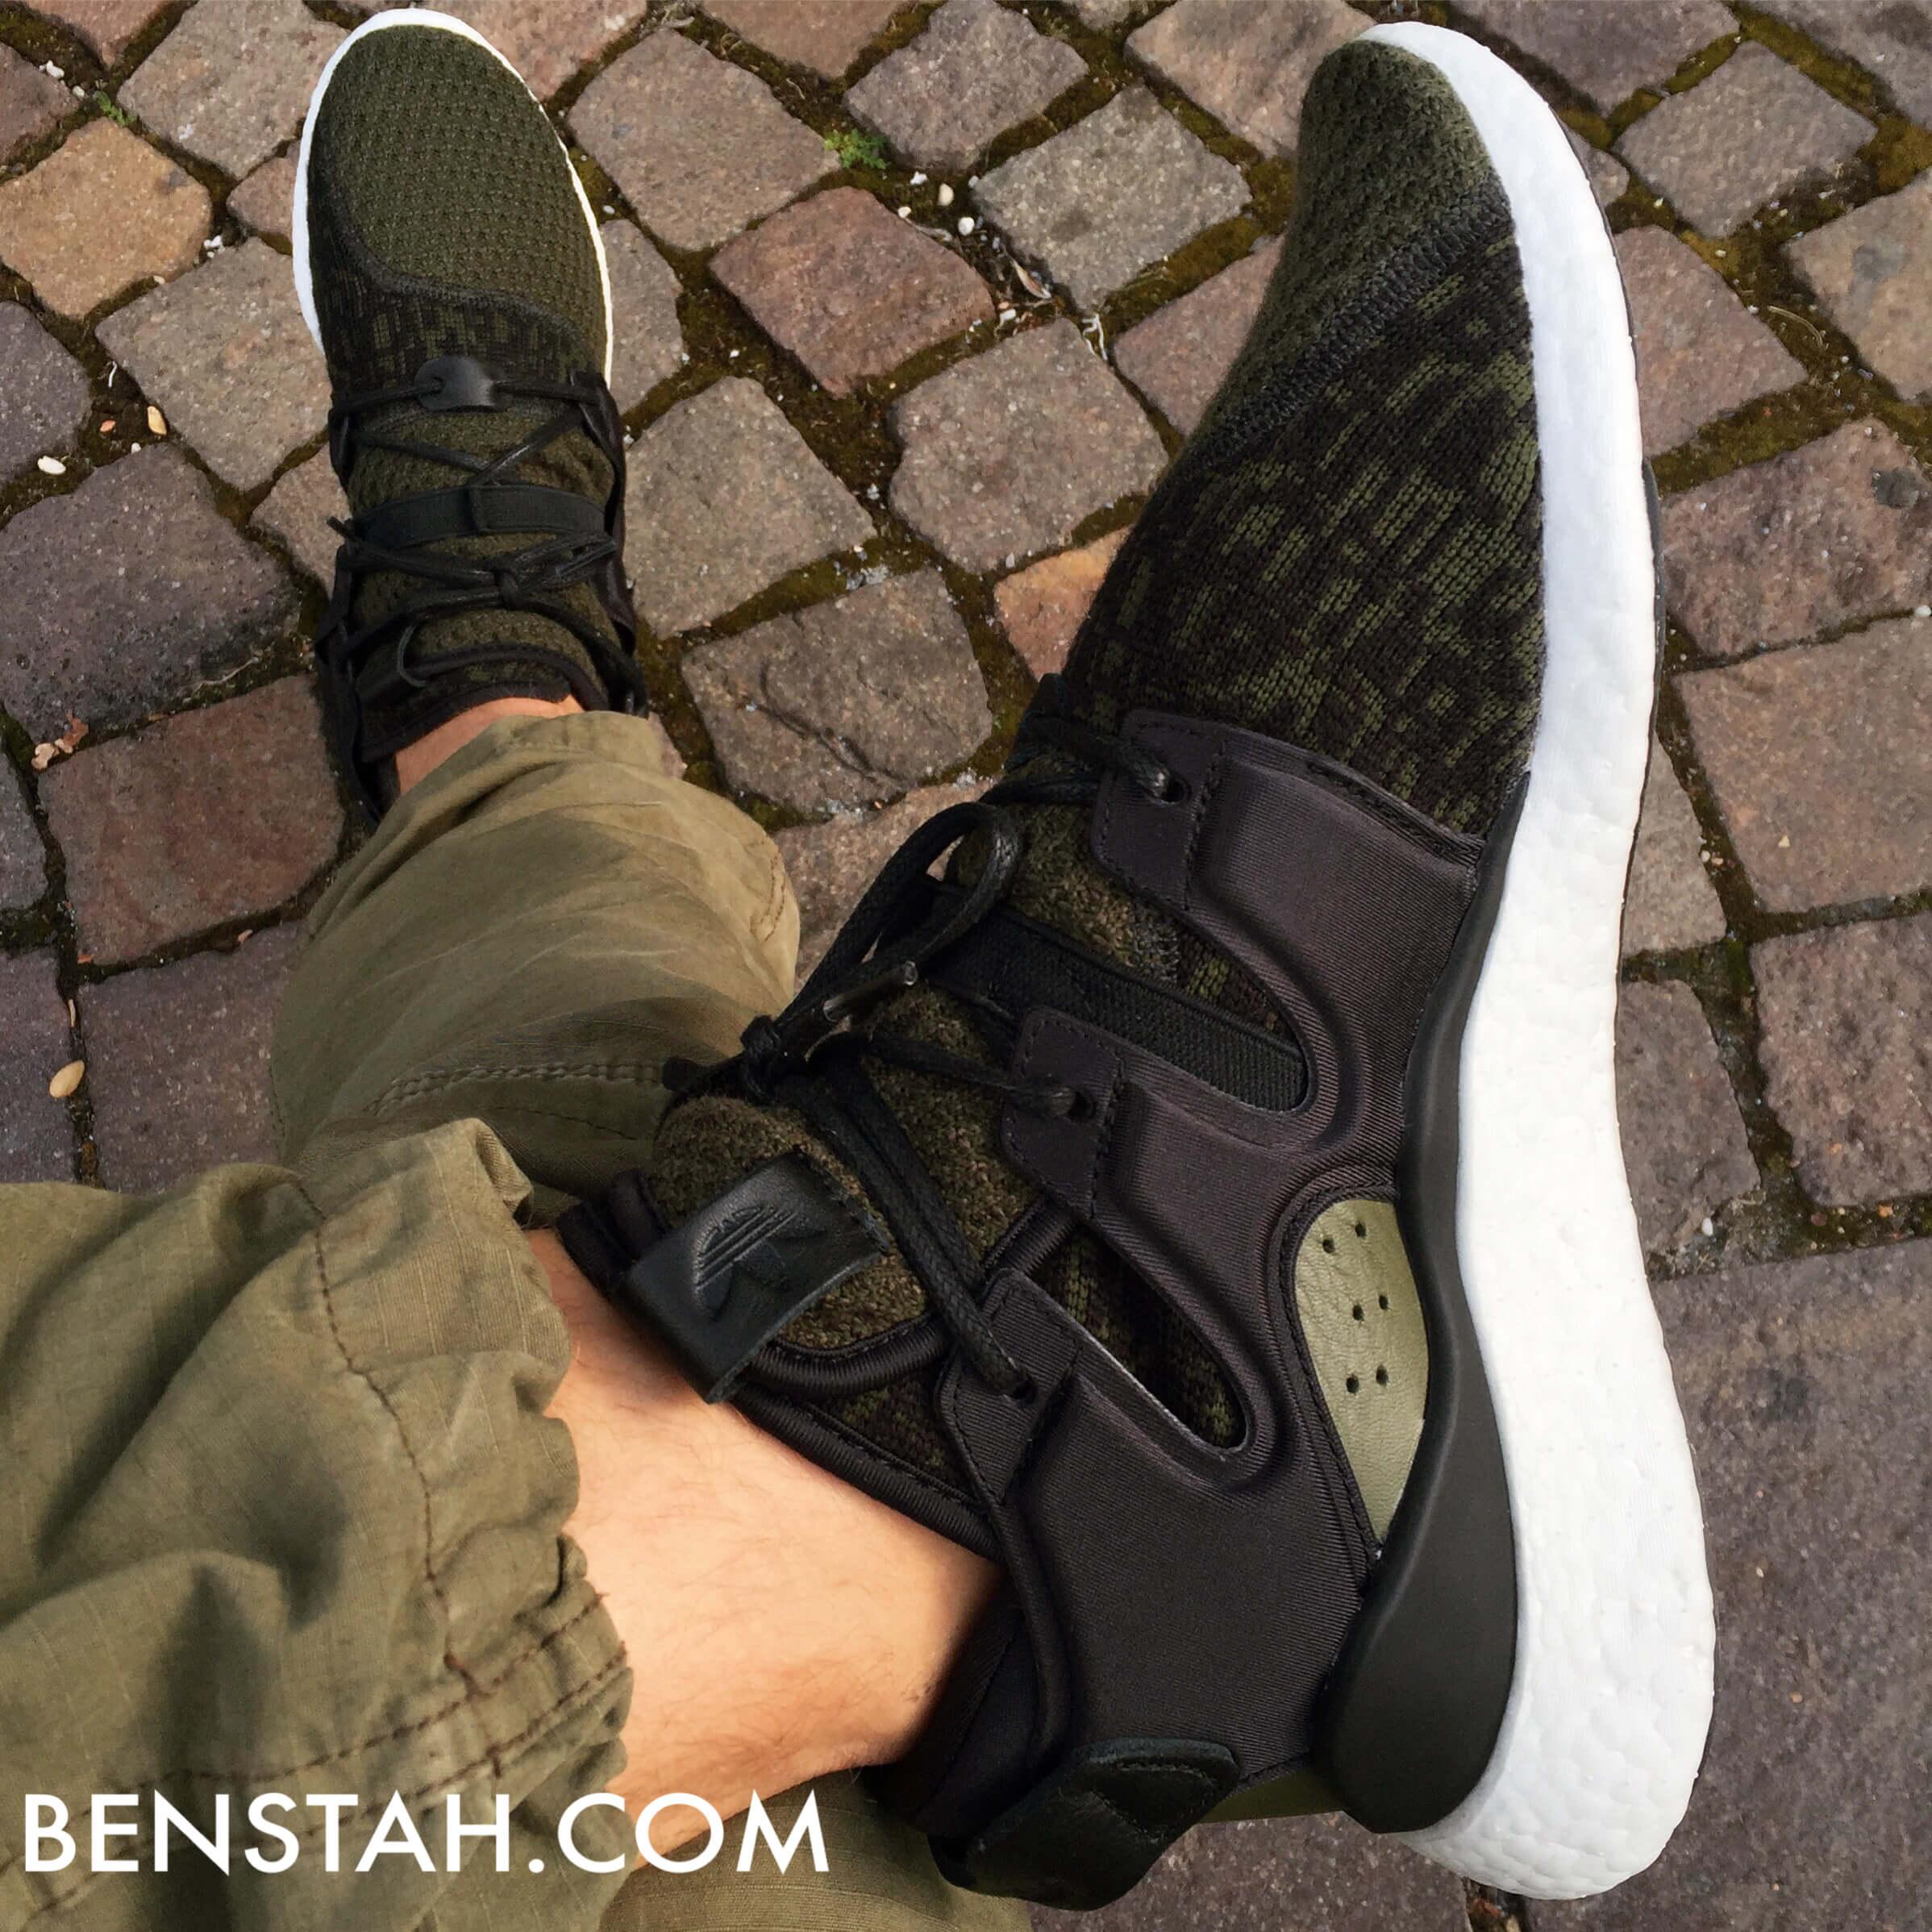 adidas-eqt-2-3-f15-athleisure-top-view-benstah-onfeet